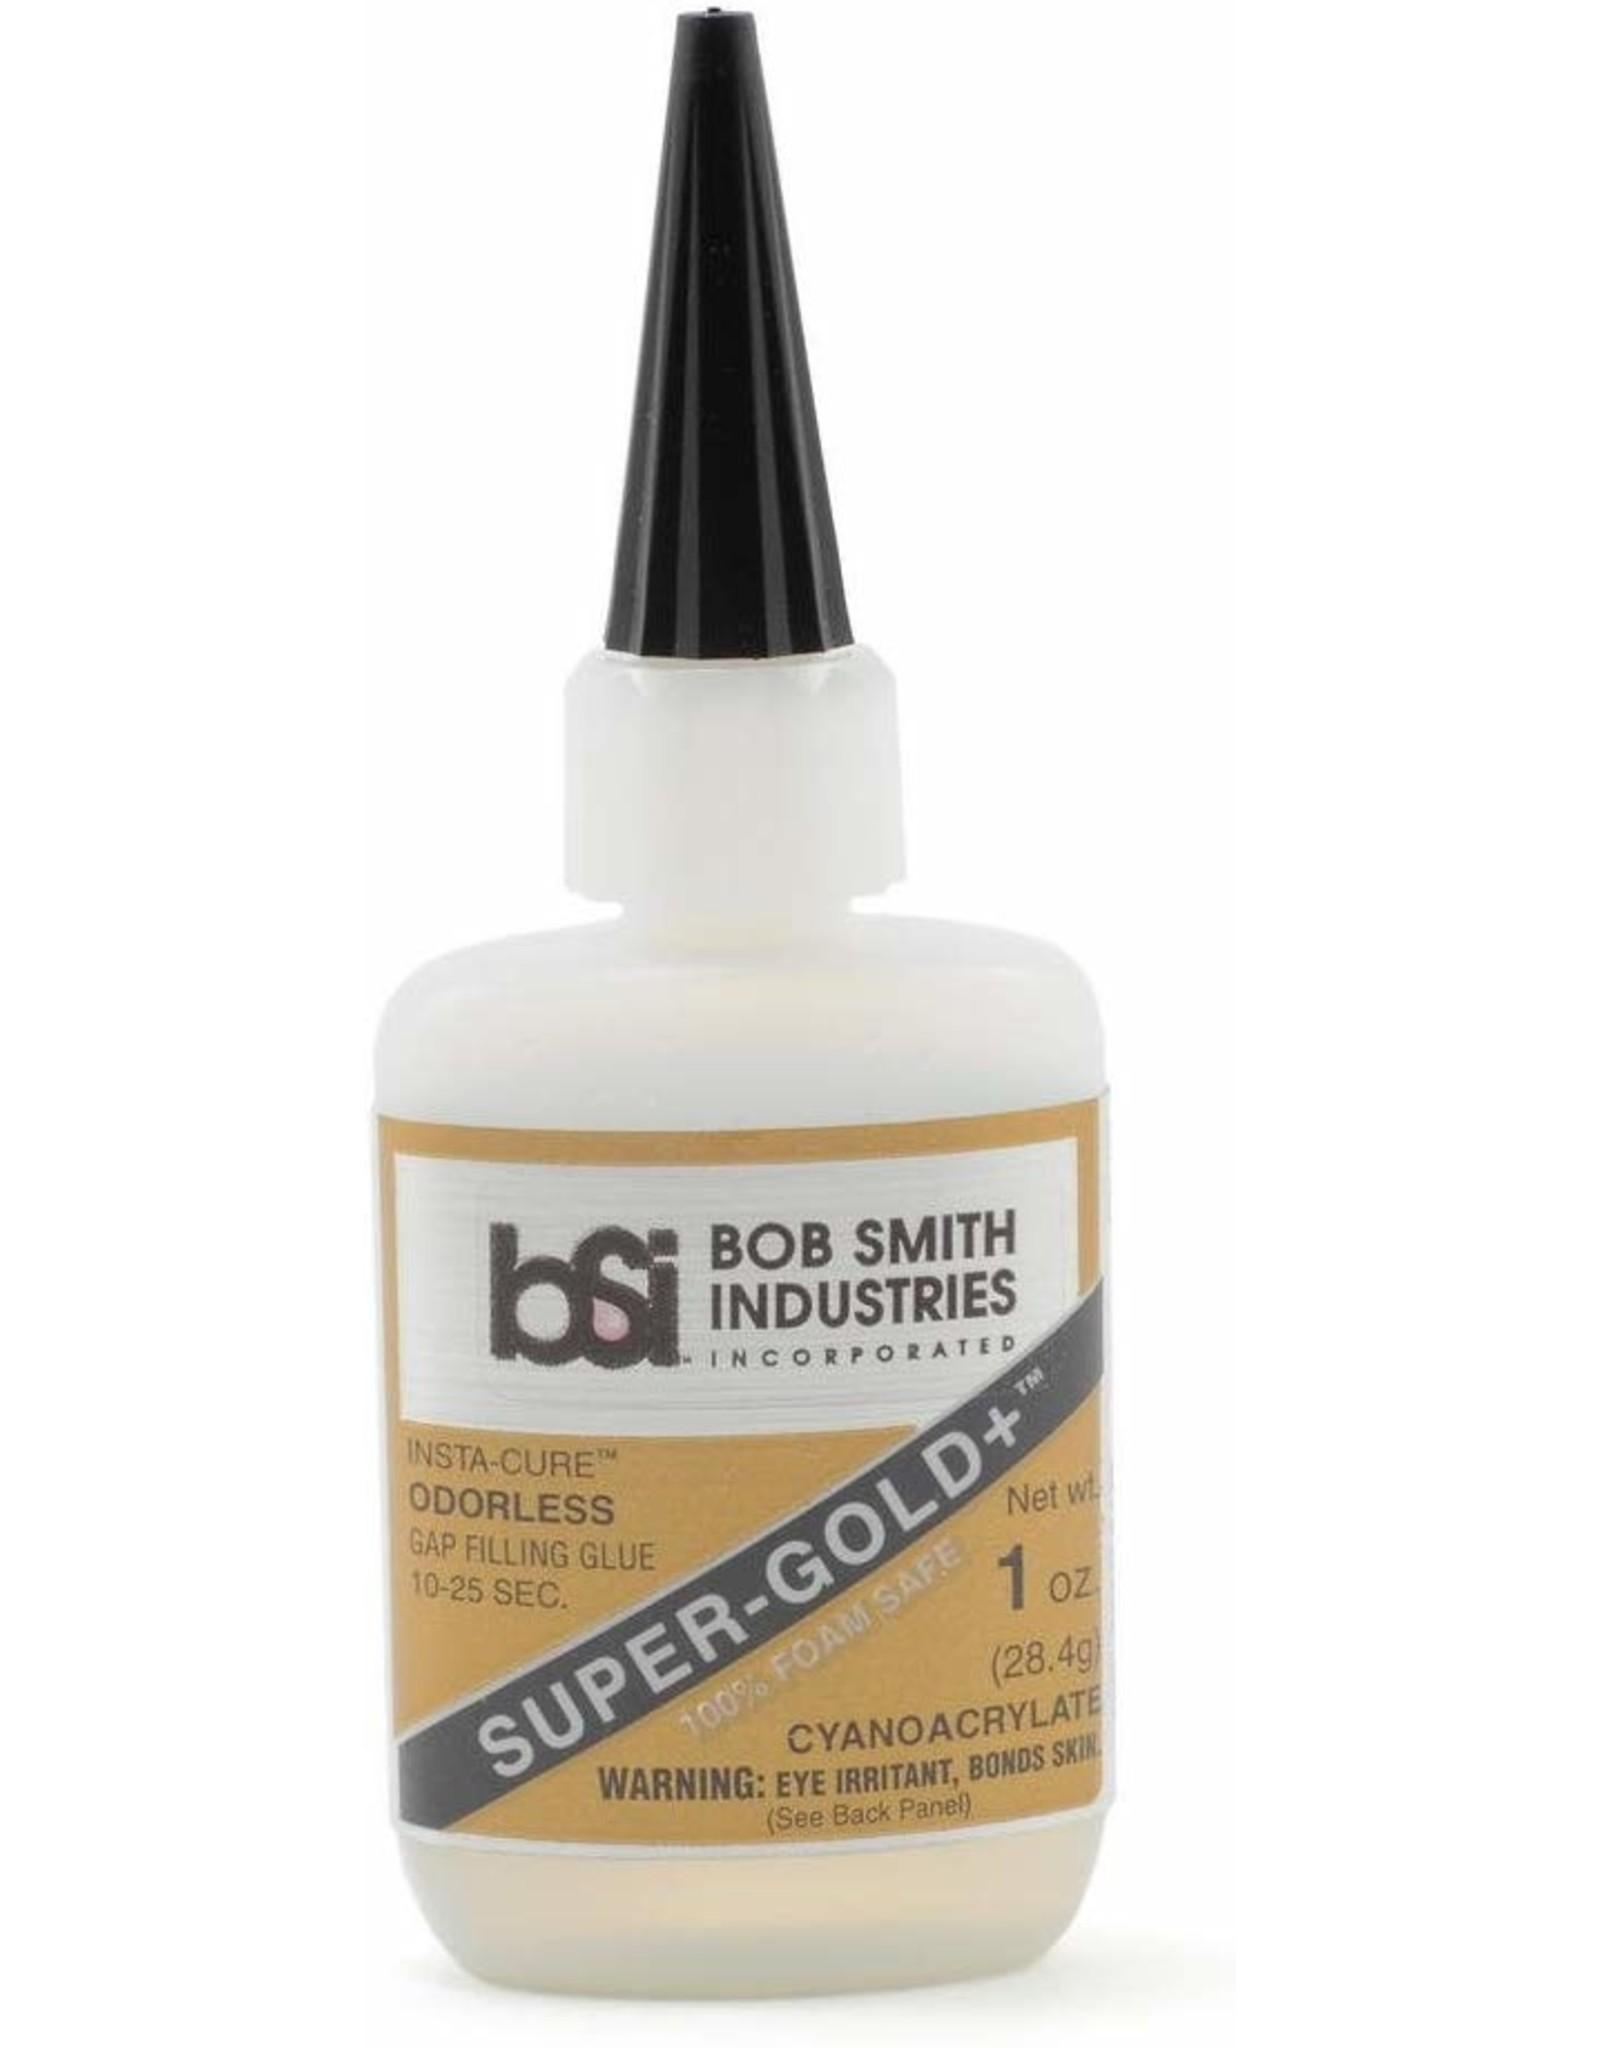 Bob Smith Industries BSI127 - Super-Gold+ (1oz)